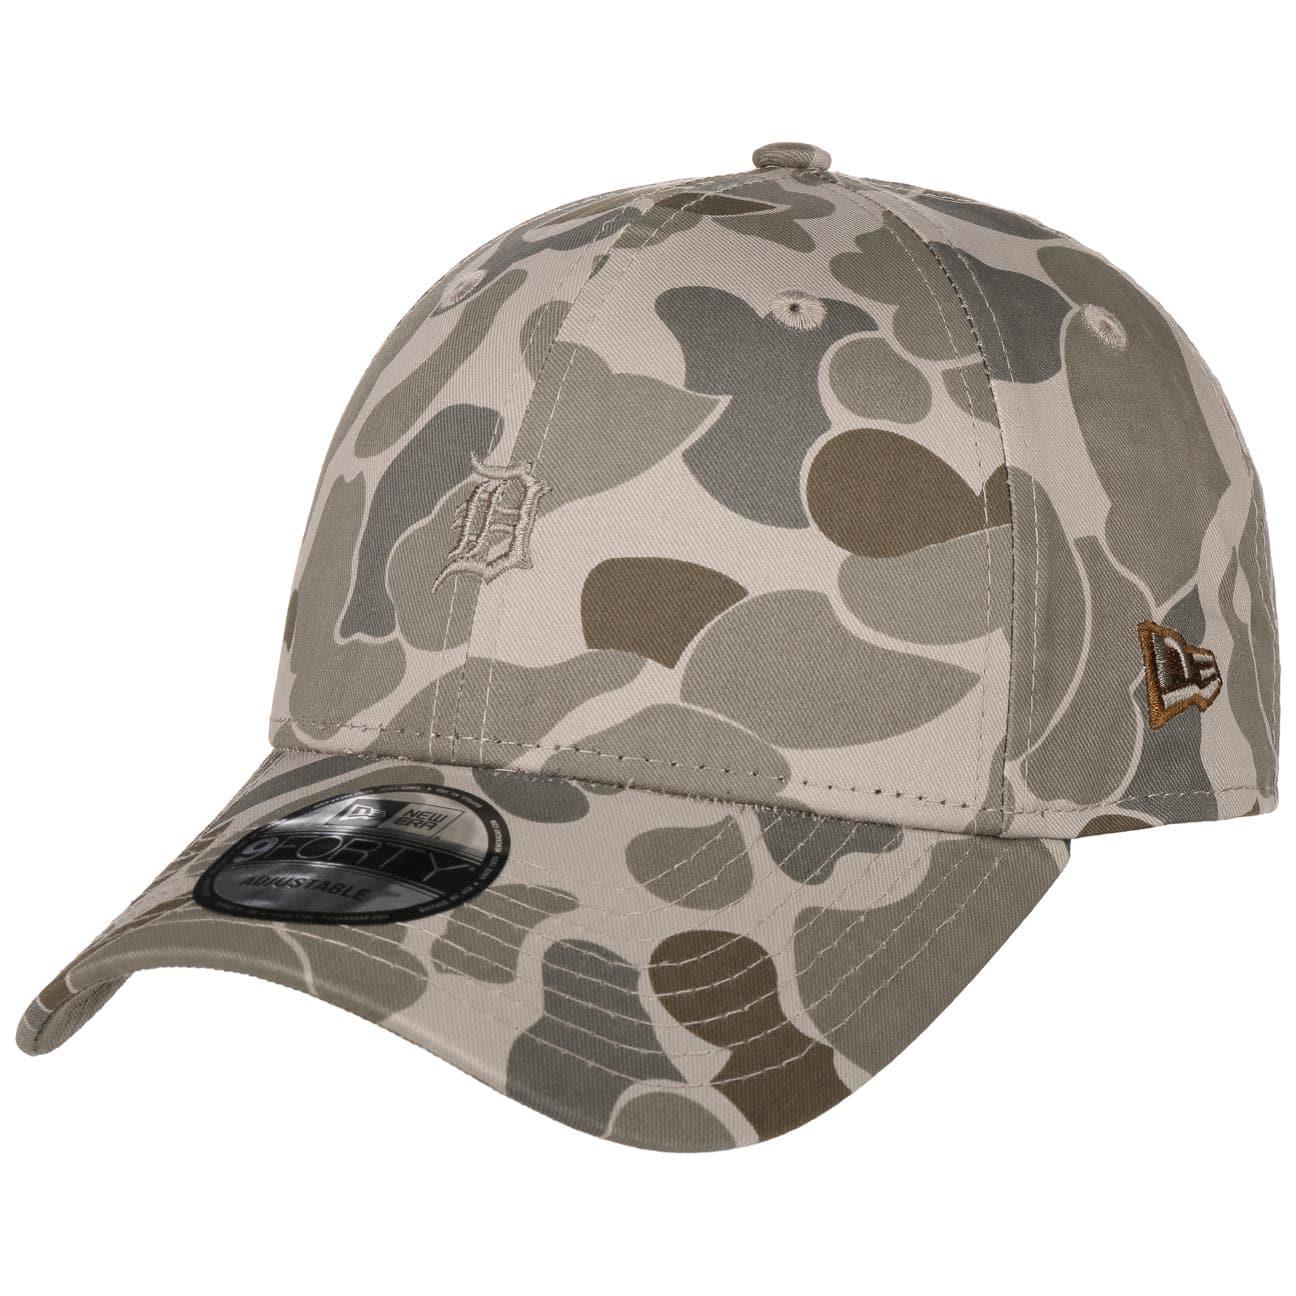 9forty-camo-tigers-cap-by-new-era-basecap